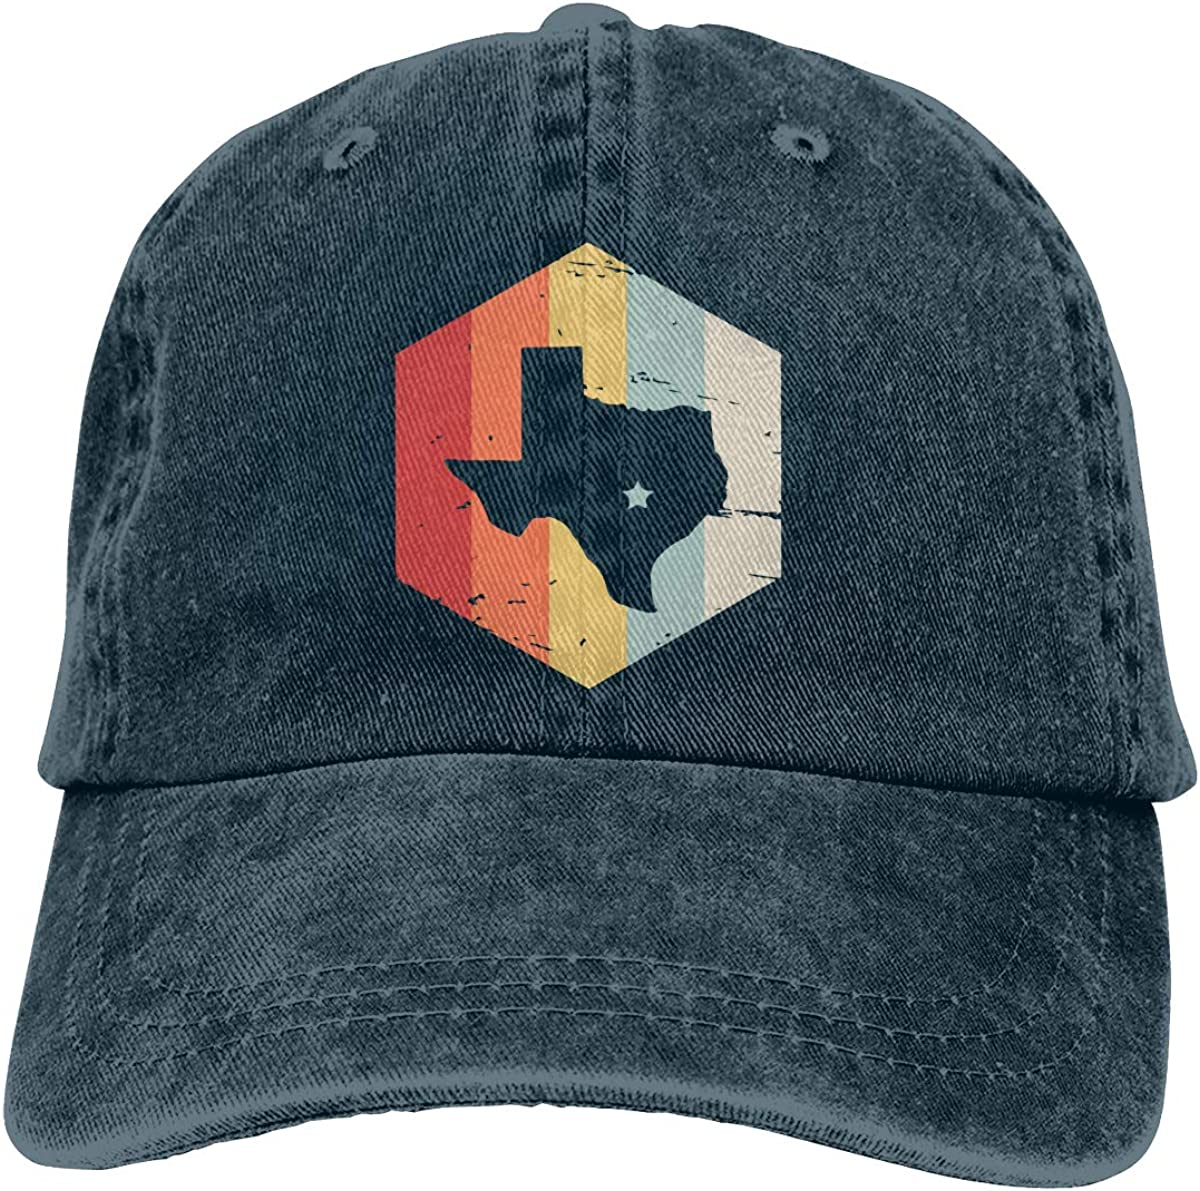 Men Women Vintage Denim Jeans Baseball Cap Retro Vintage Texas Headwear